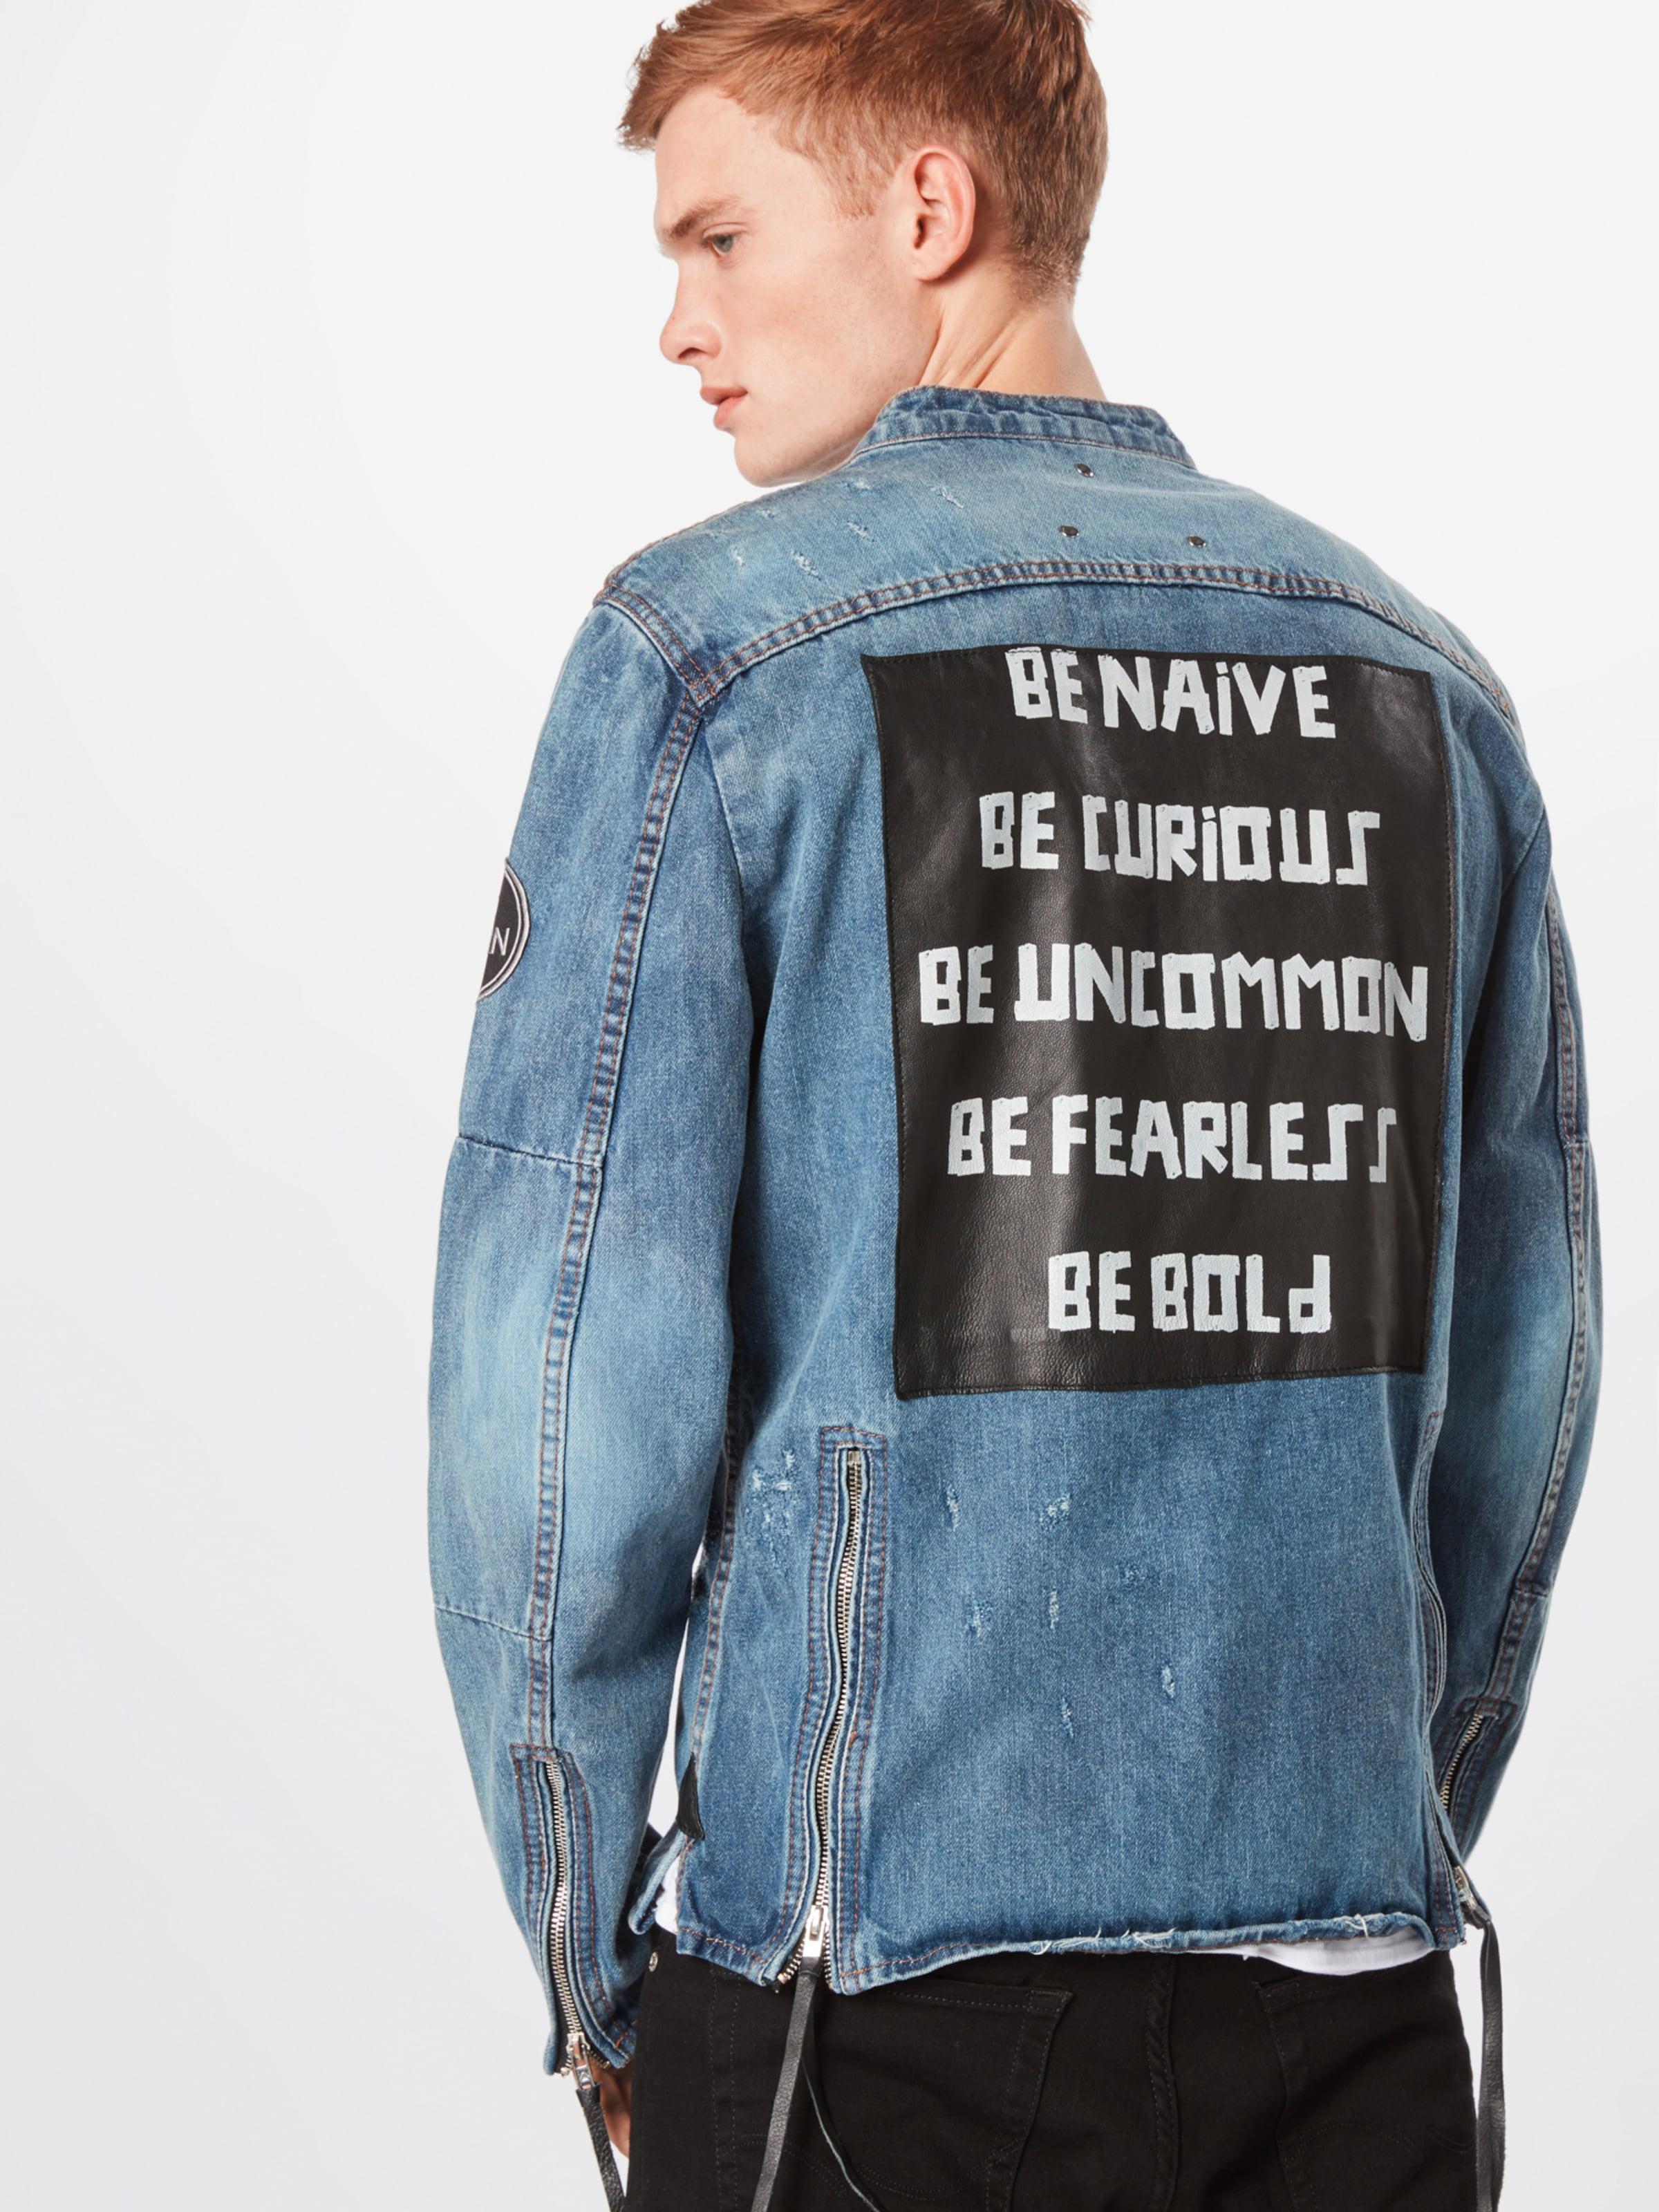 'bephil Be D' Bleu Edgy saison Mi Denim Veste En gv7Ybf6y